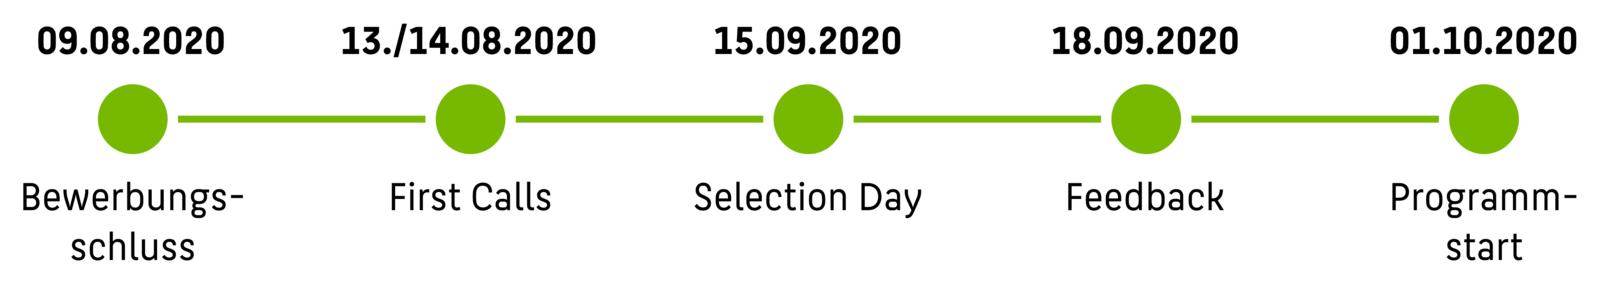 Timeline: 09.08.2020 Bewerbungsschluss, 13./14.08.2020 First Calls, 15.09.2020 Selection Day, 18.09.2020 Feedback, 01.10.2020 Programmstart